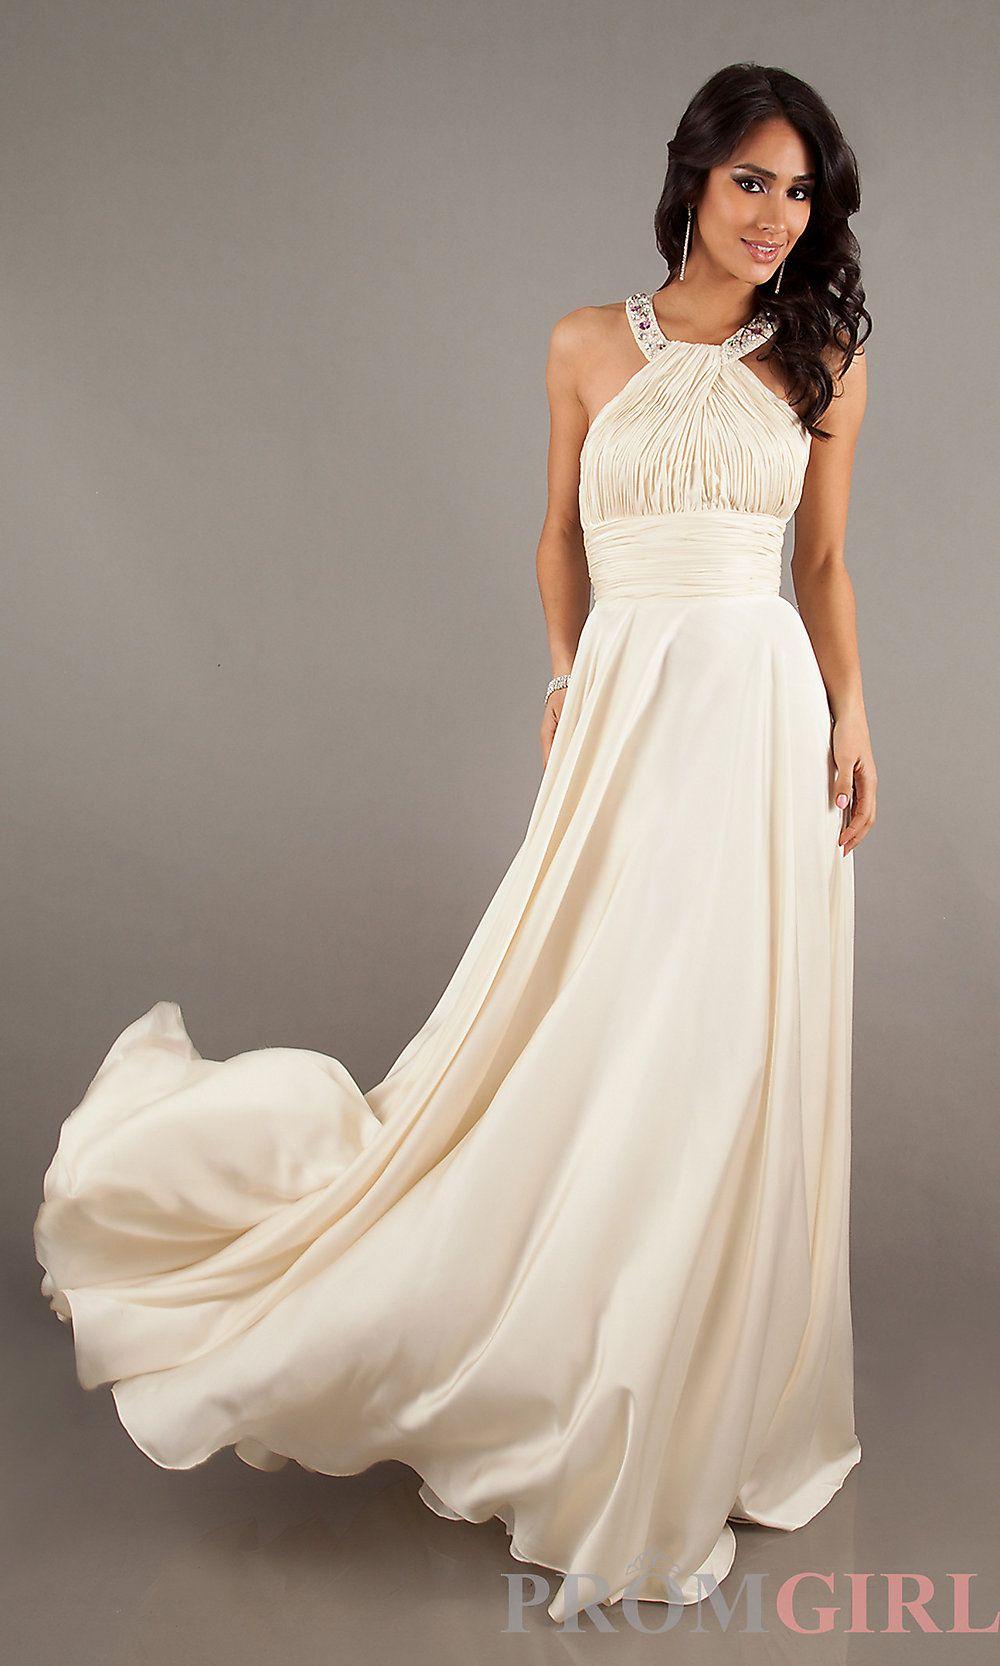 Highneck long halter prom gown care pinterest dresses prom